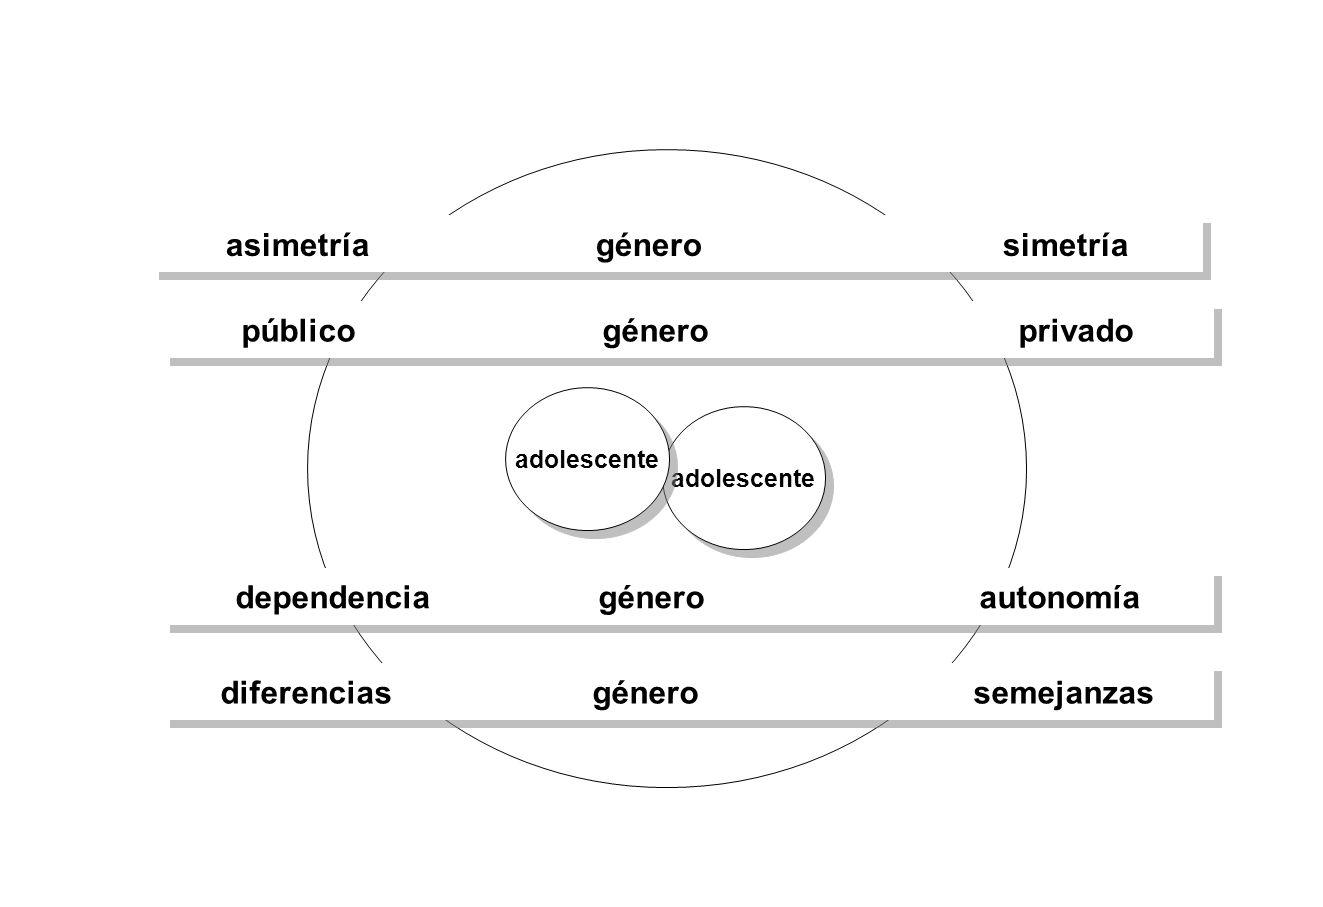 adolescente asimetría género simetría dependencia género autonomía diferencias género semejanzas público género privado